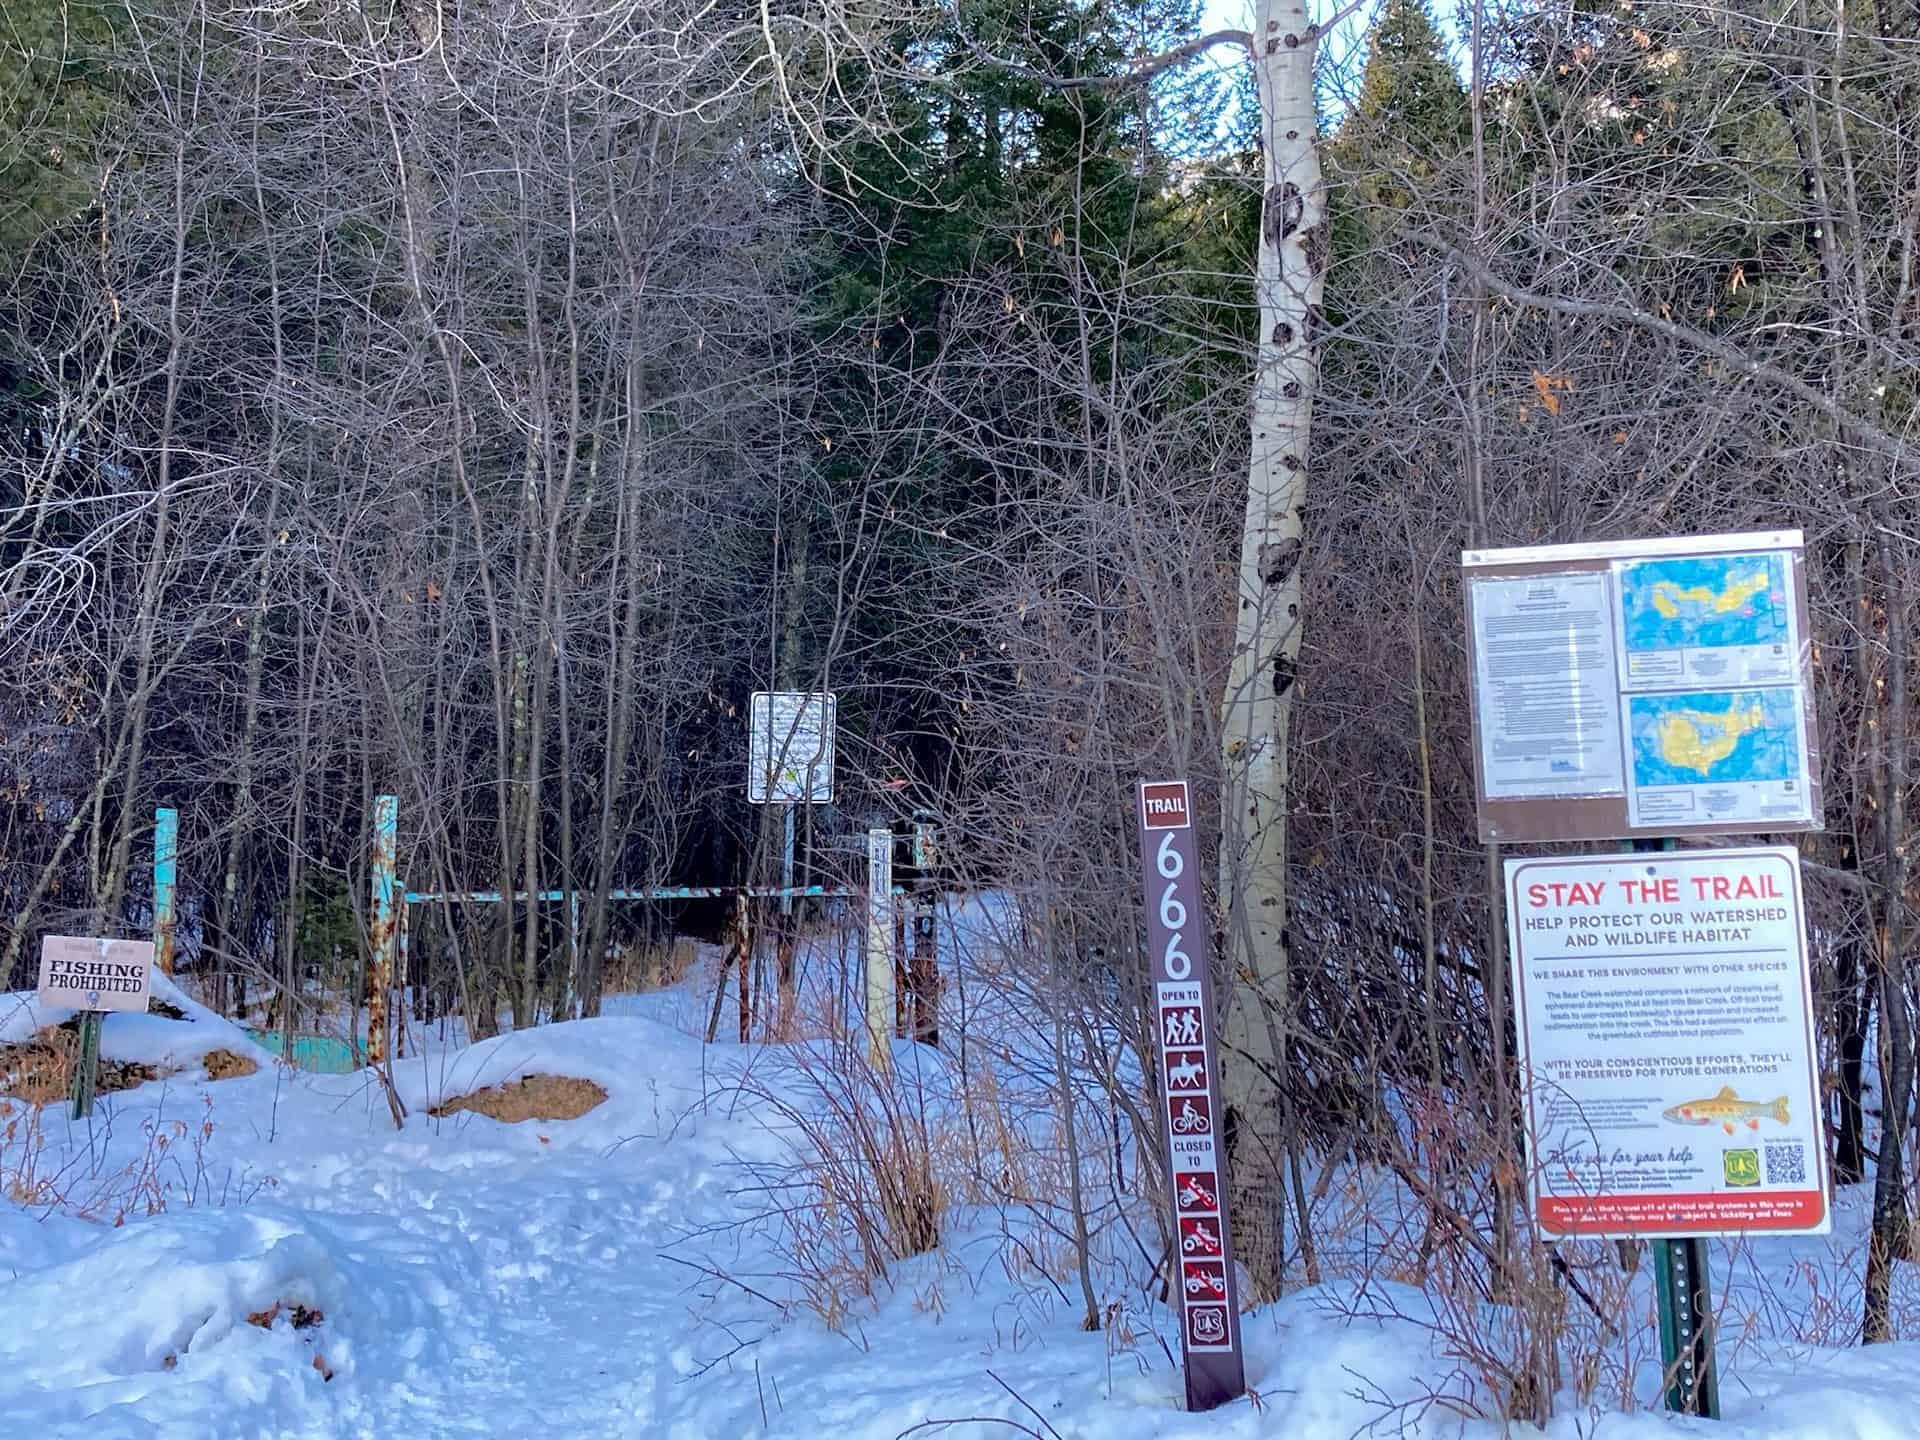 Mt. buckhorn trail junction 666